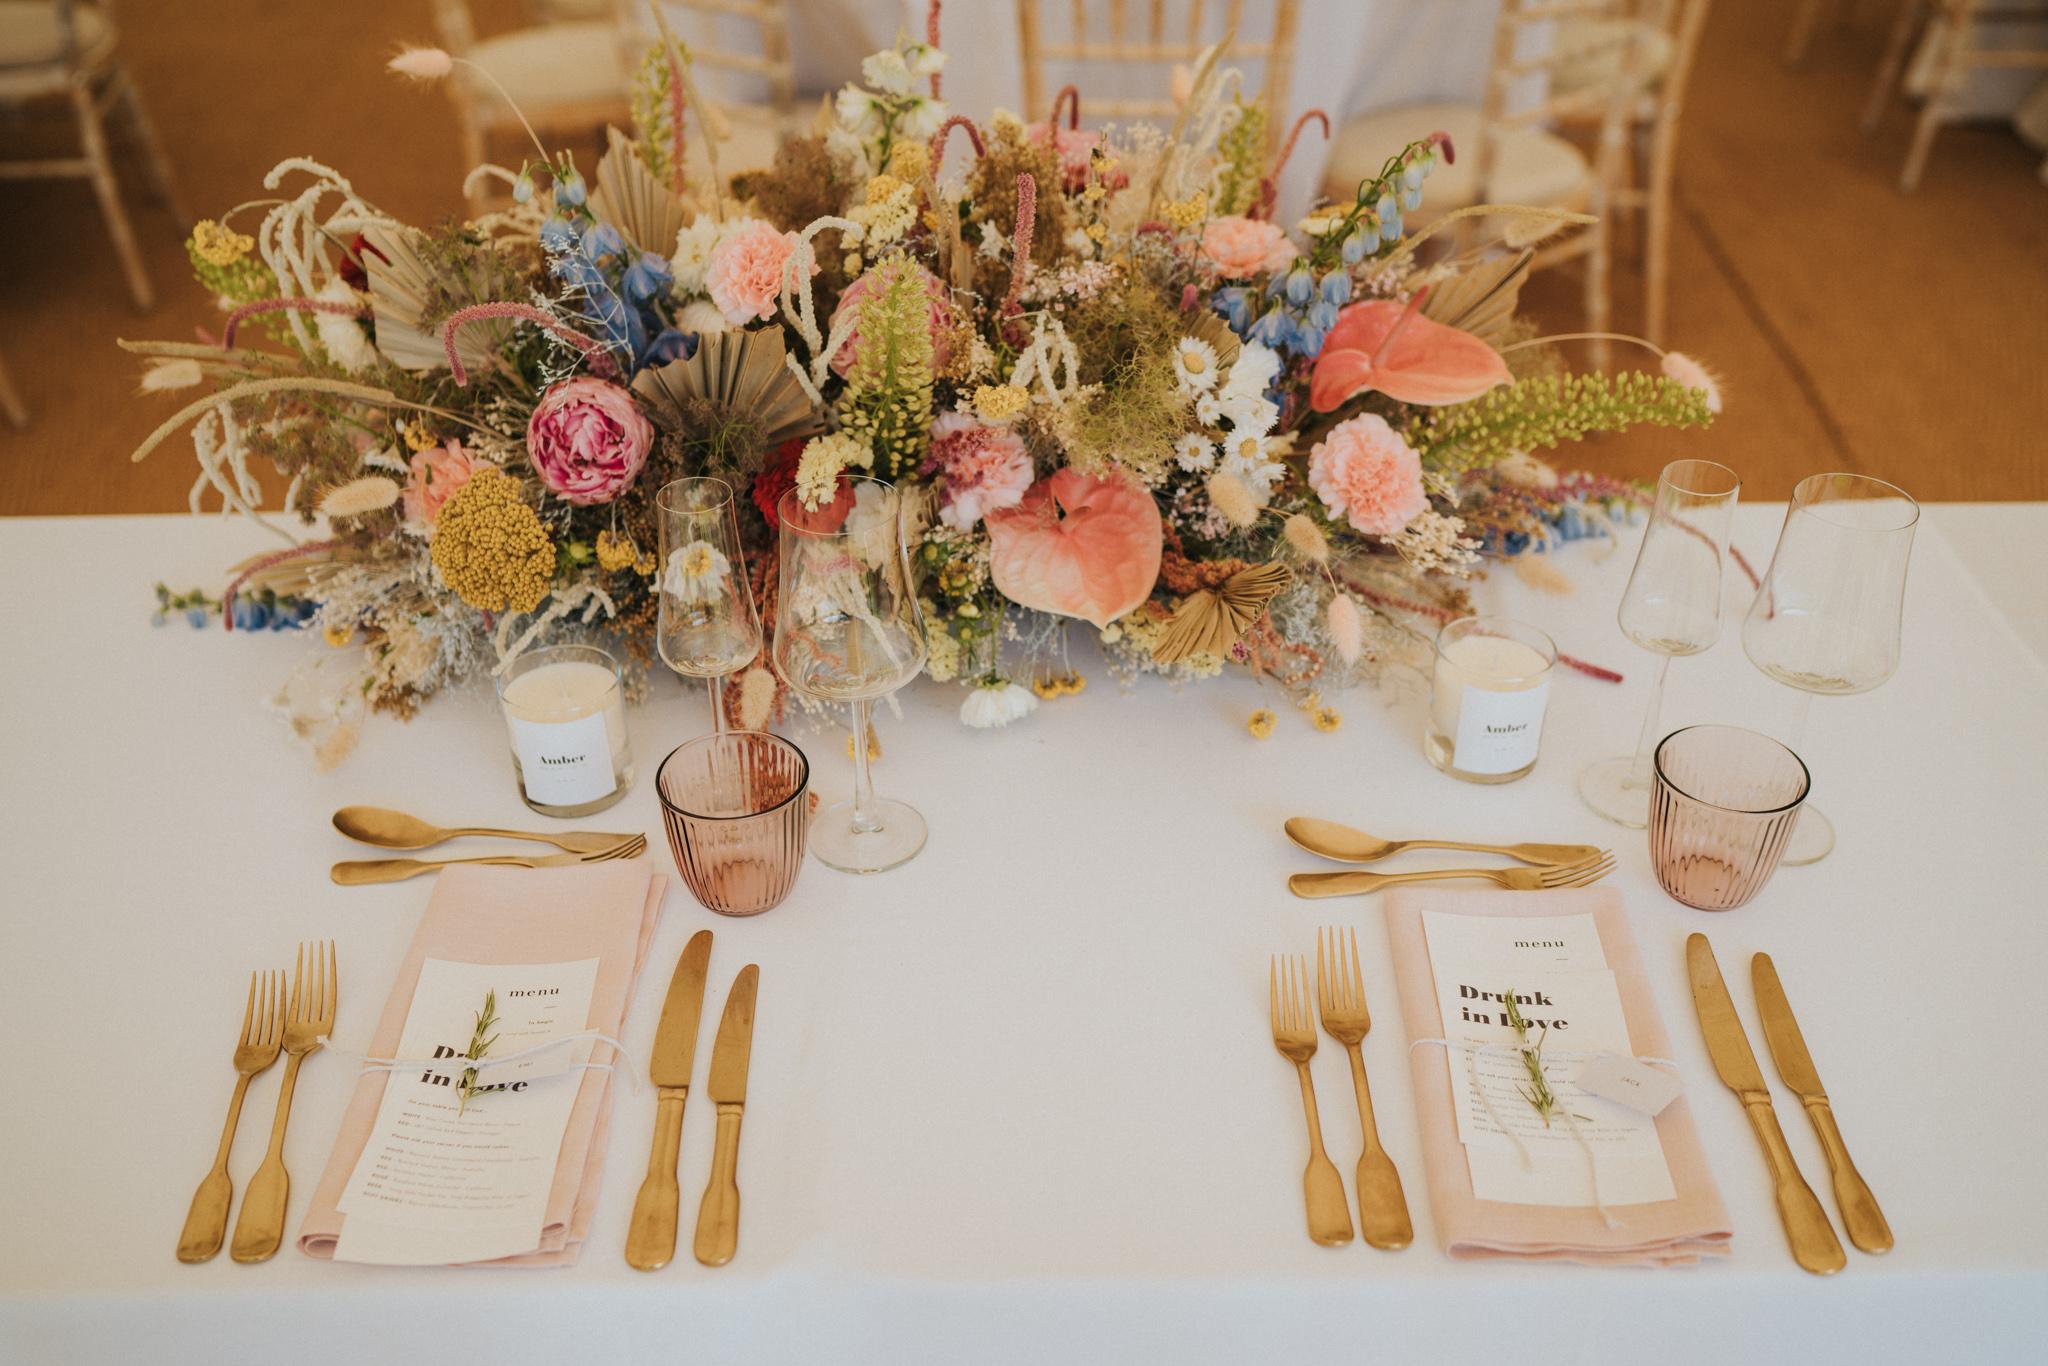 emi-Jack-boho-diy-wedding-eggington-house-grace-elizabeth-colchester-essex-alternative-wedding-photographer-suffolk-norfolk-devon (25 of 56).jpg